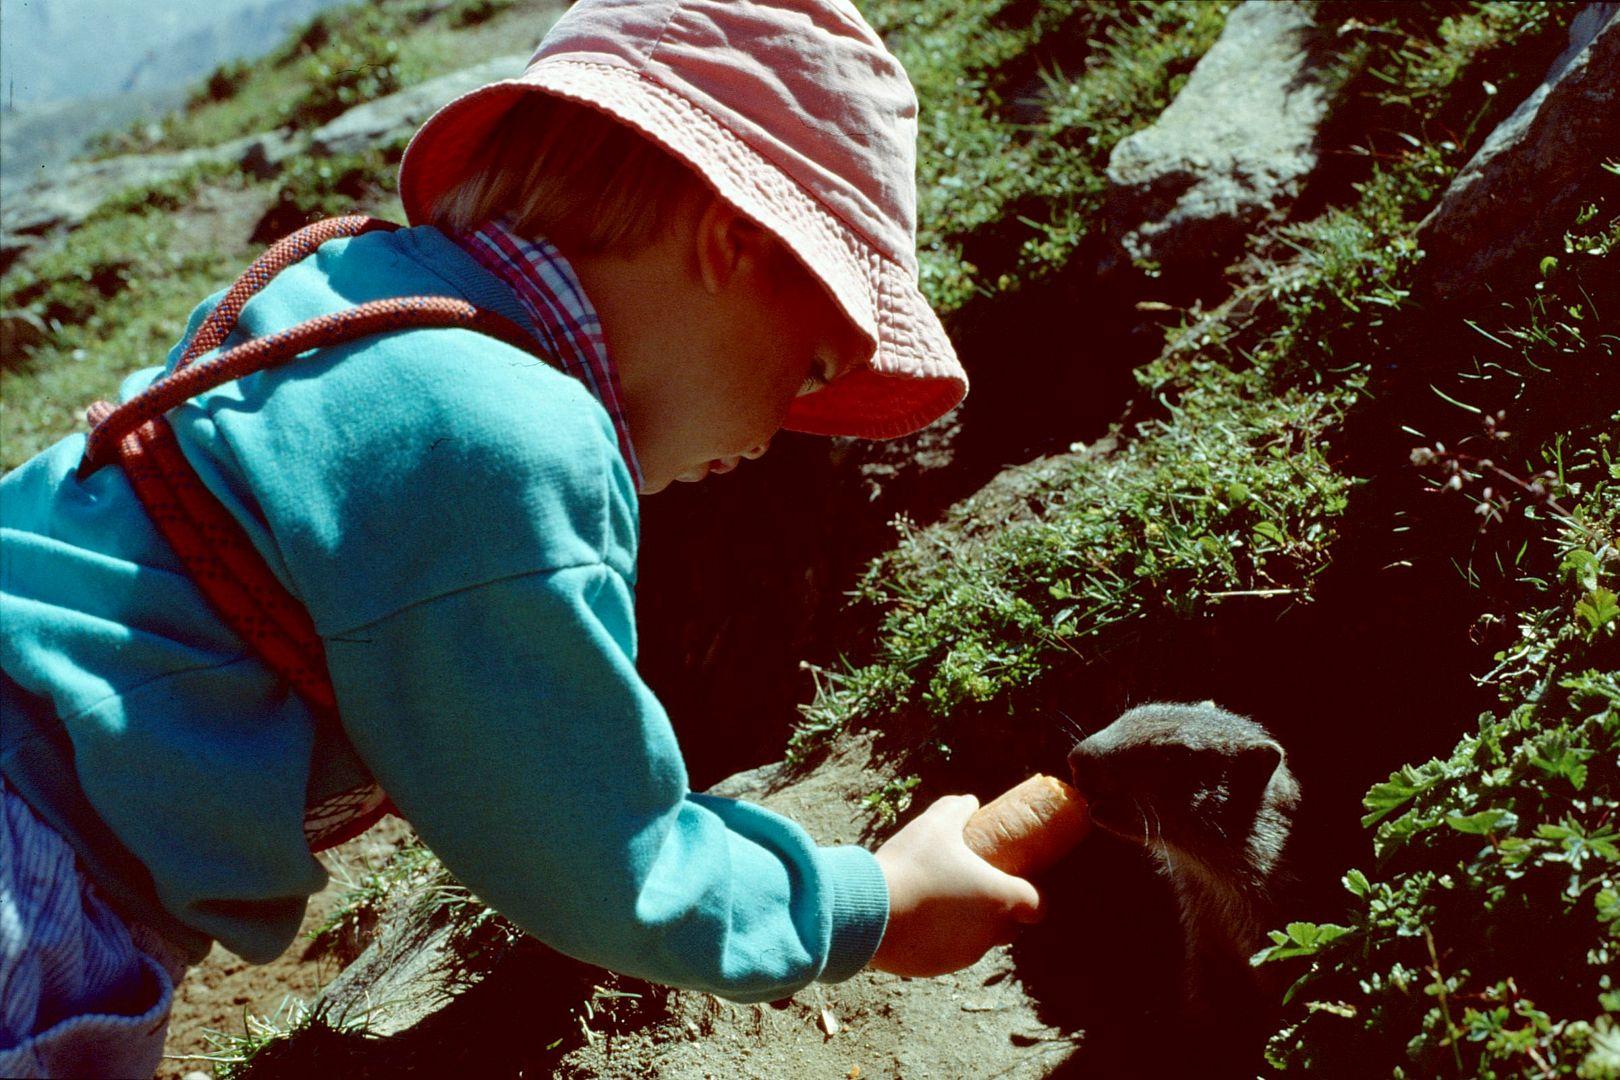 Murmeltierfuetterung unter'm Spielboden bei Saas Fee